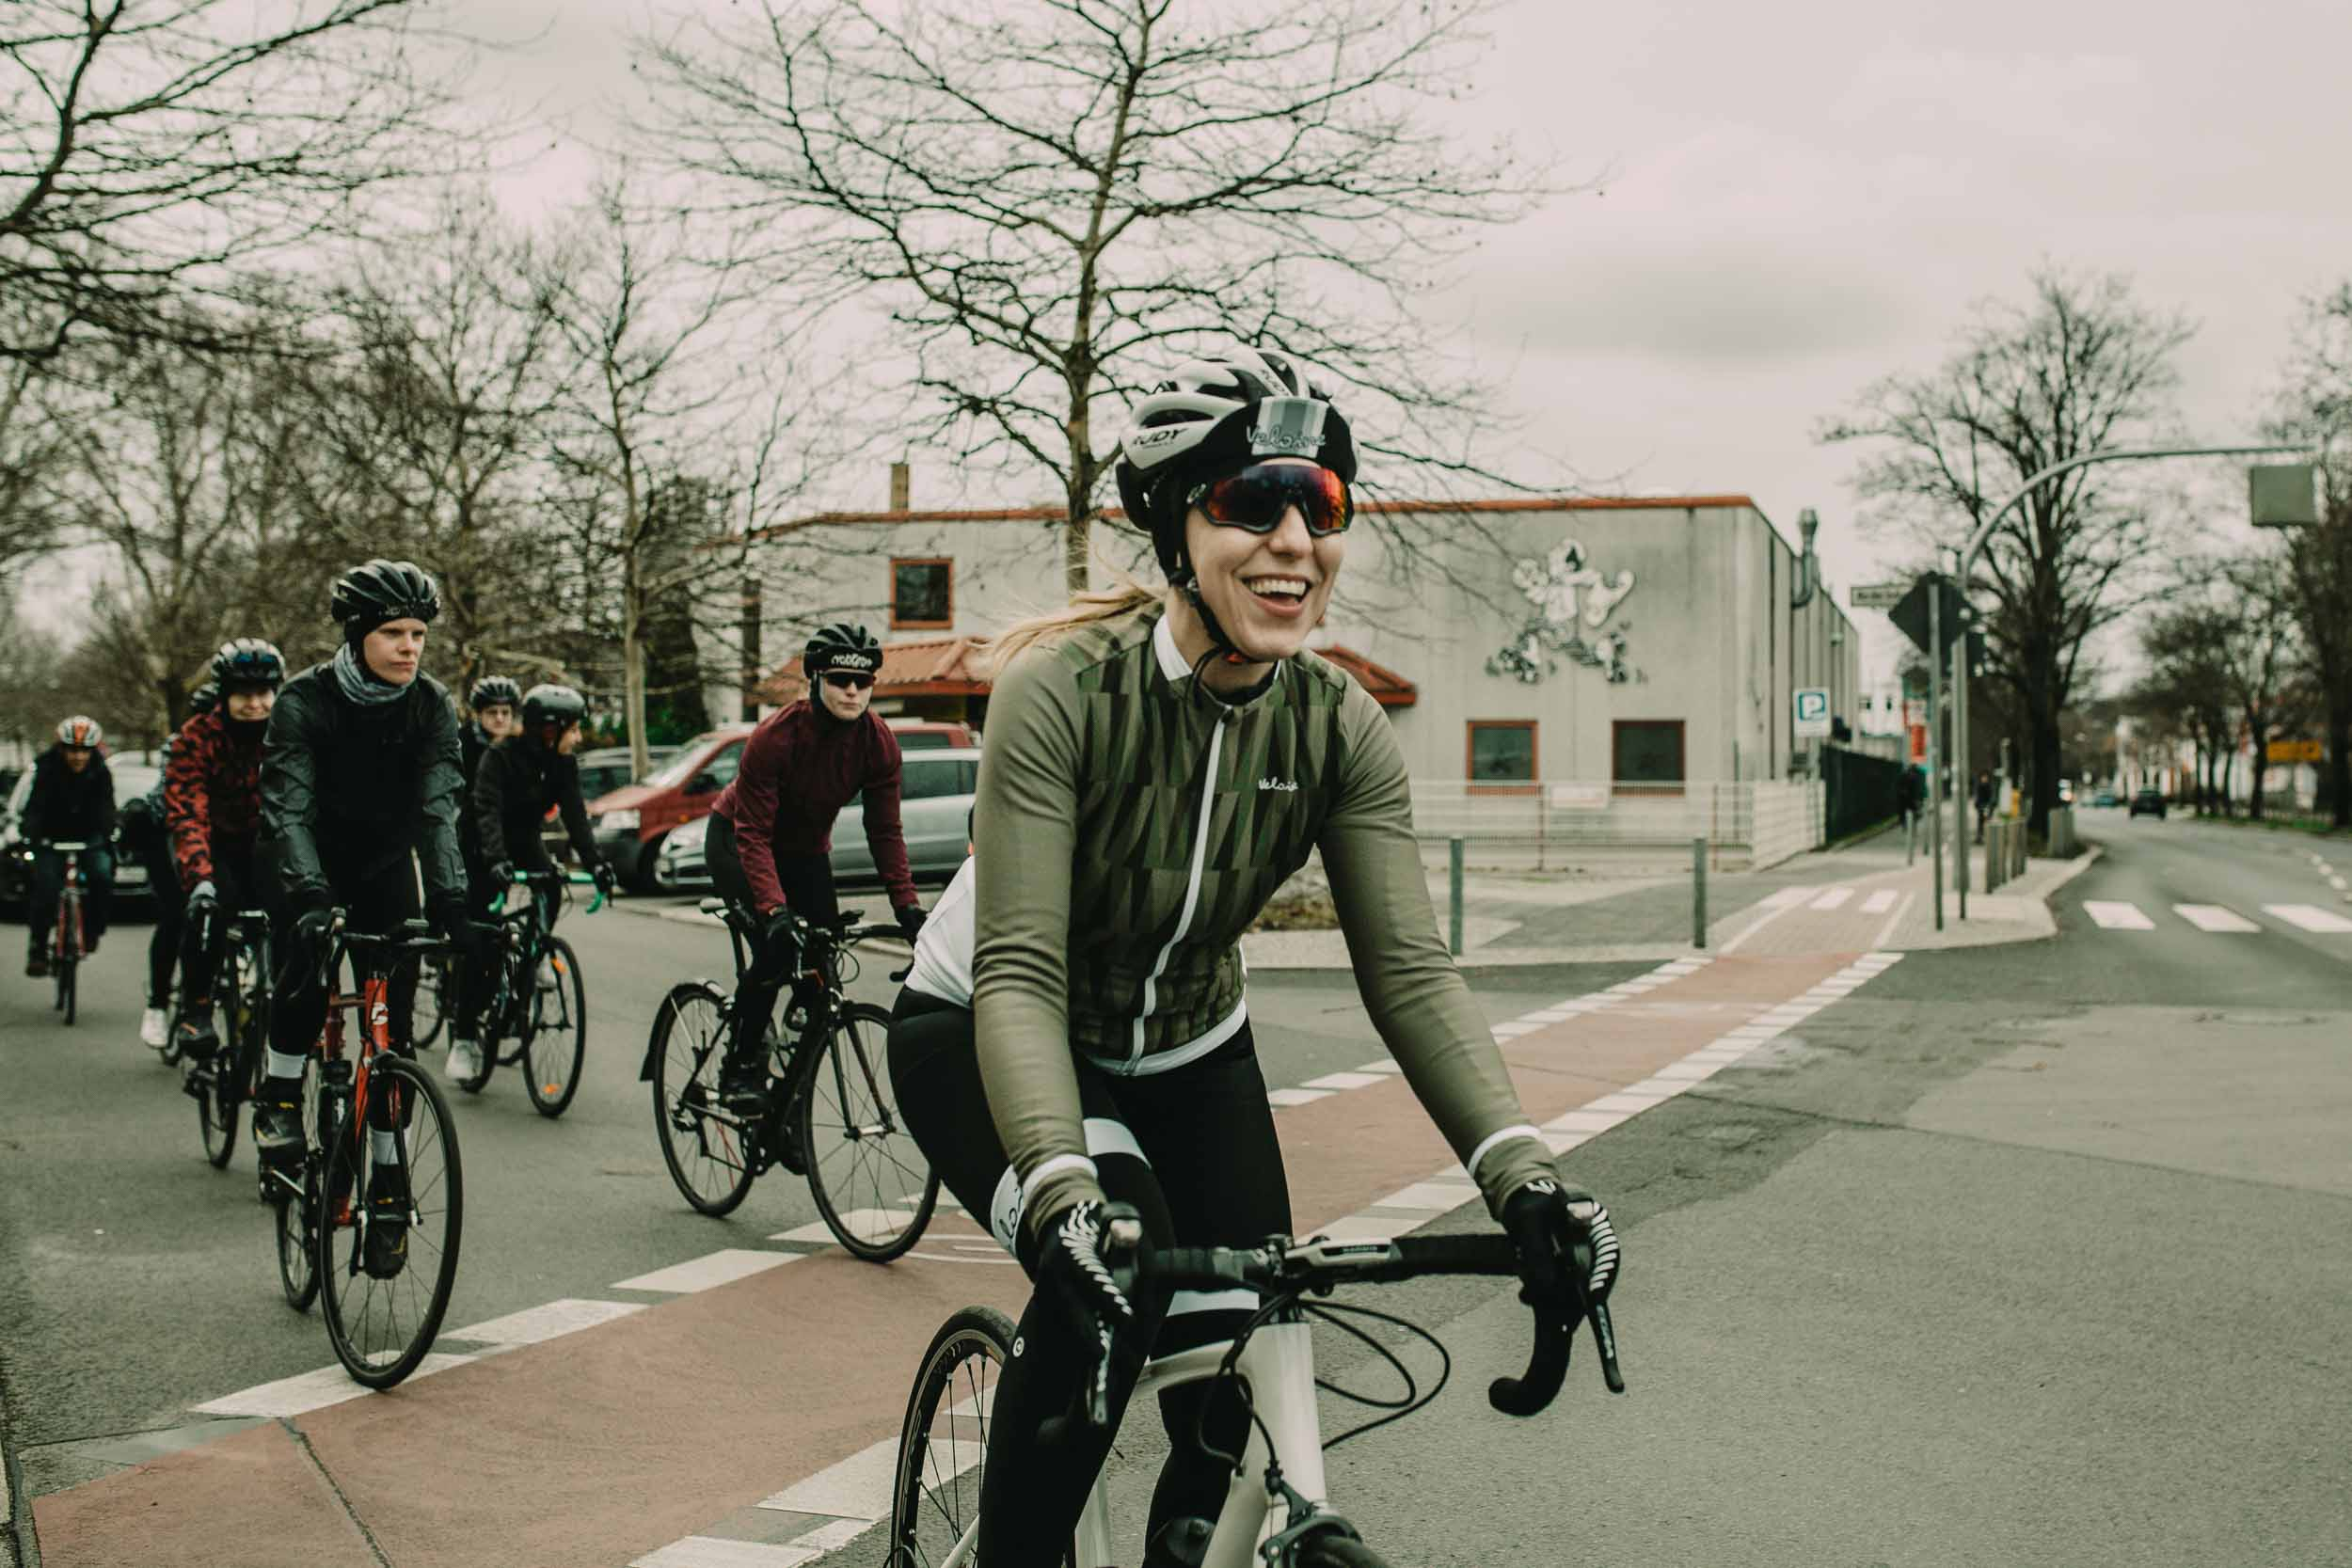 Kolektif_BikeFair_Berlin_YHutterer_Web_134.jpg